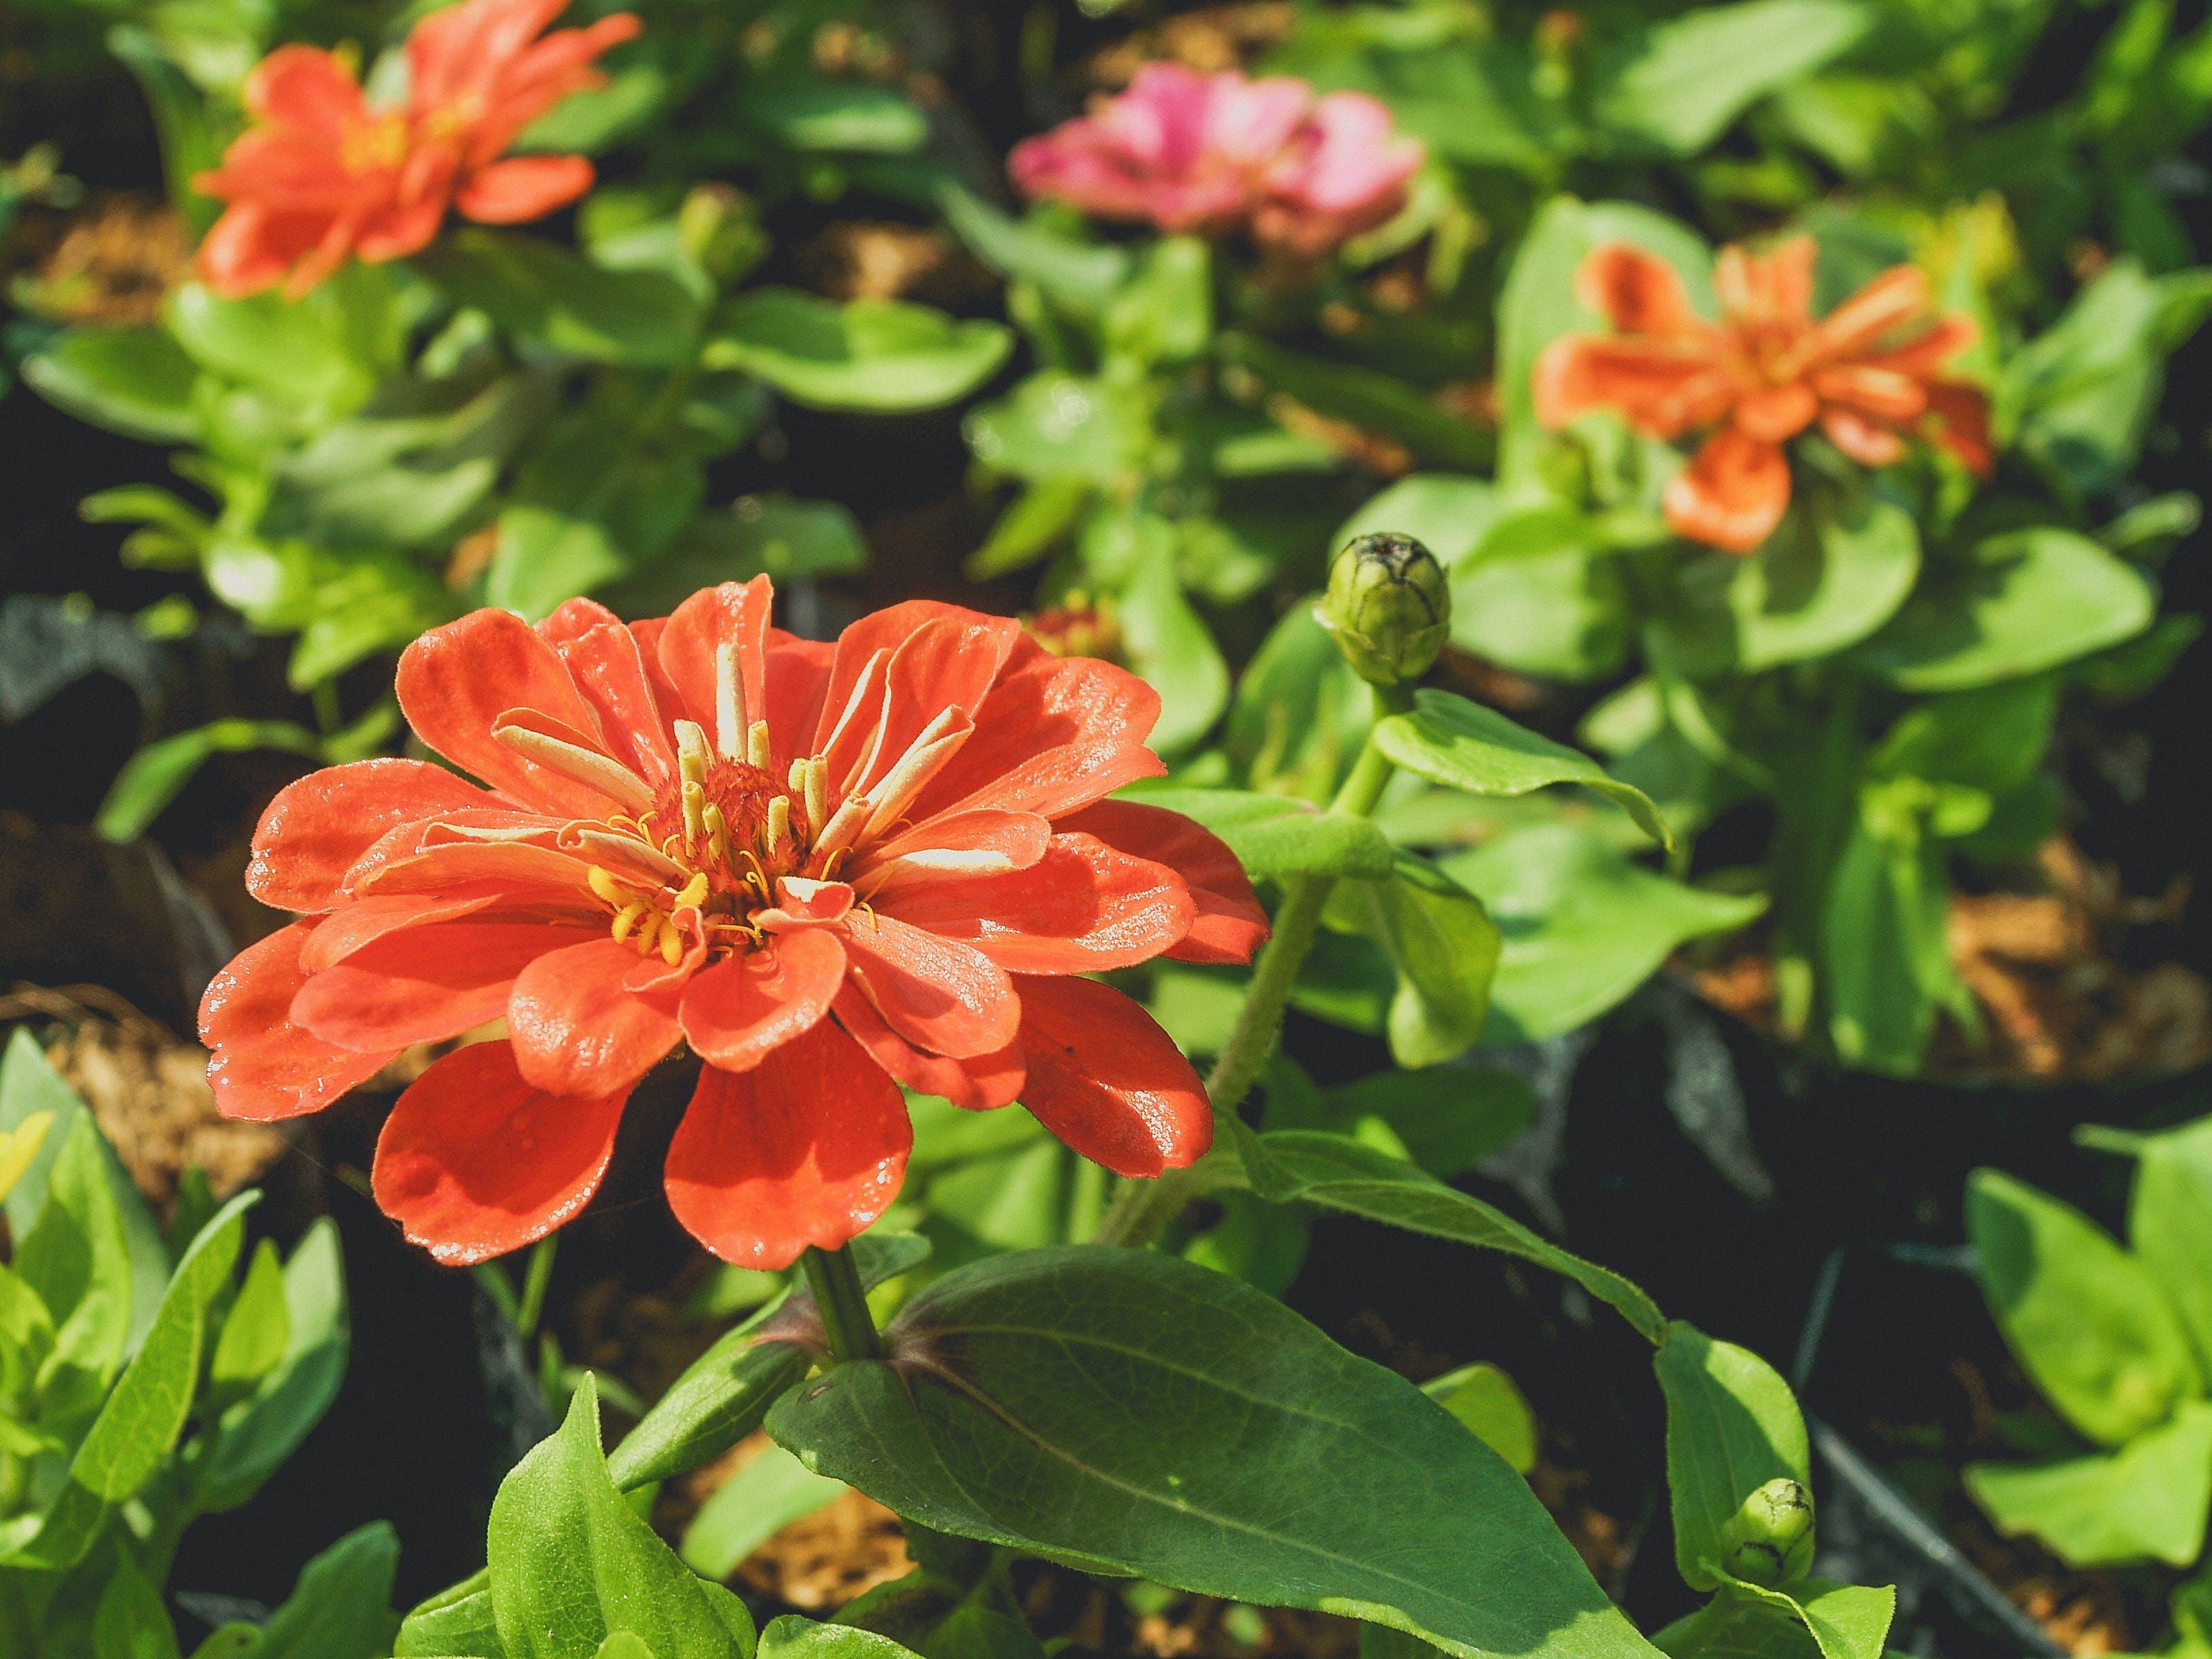 Selective Focus Photo Of Orange Petaled Flower